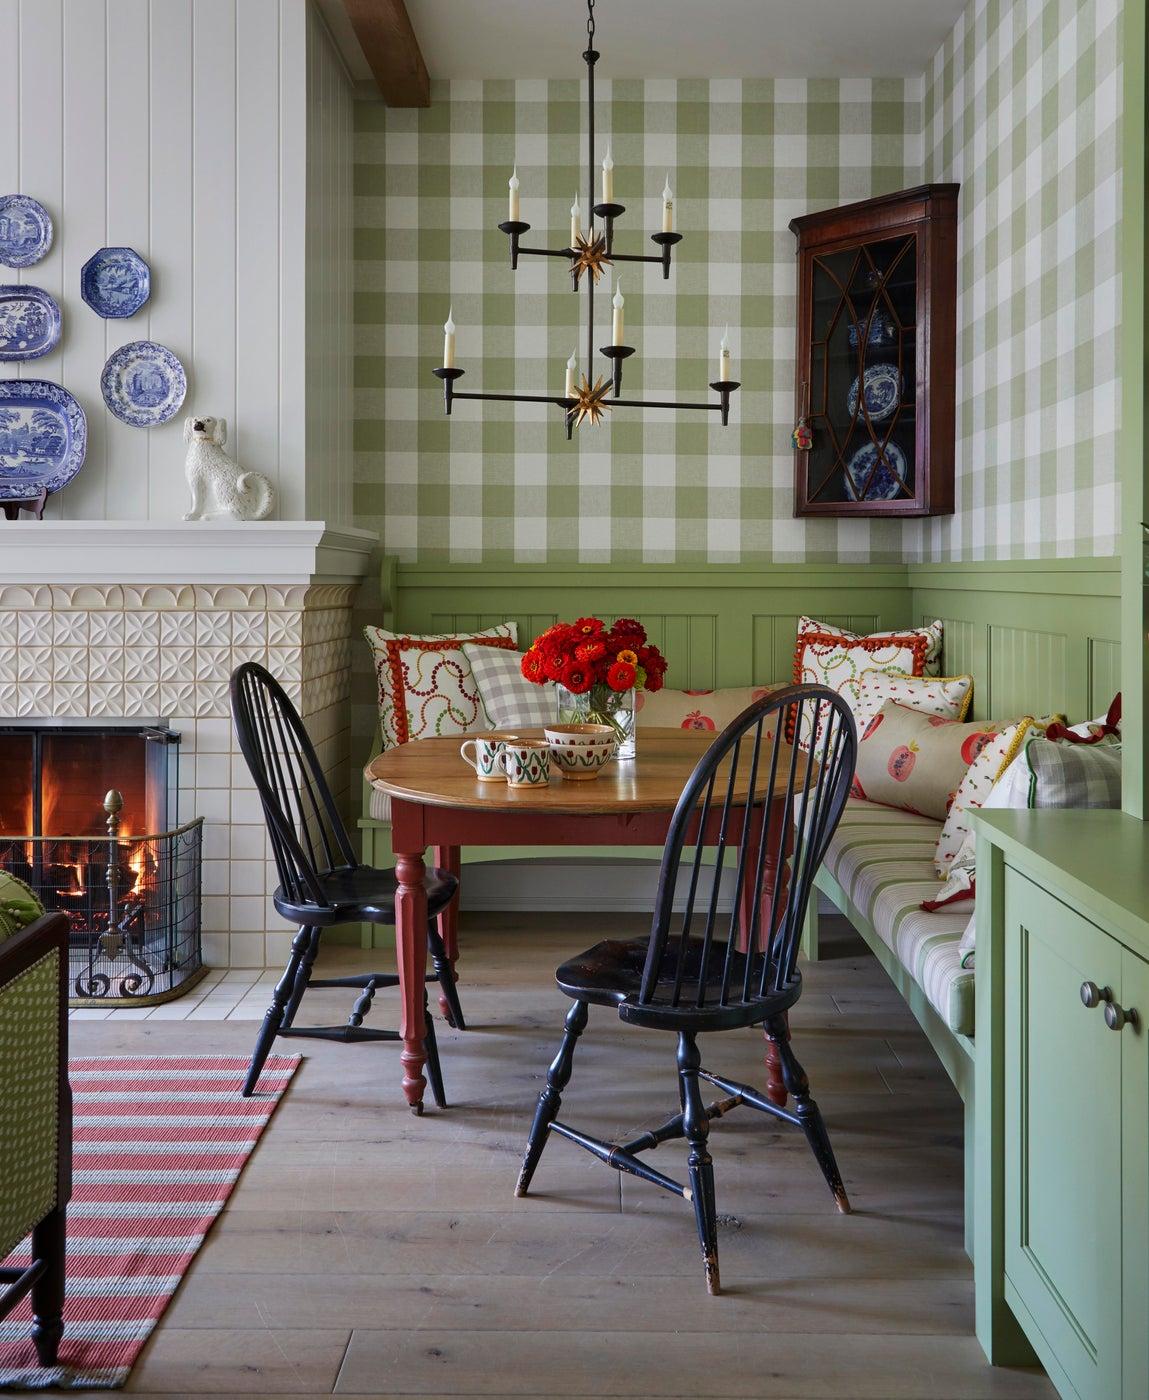 Breakfast room in chic farmhouse kitchen, green gingham wallpaper